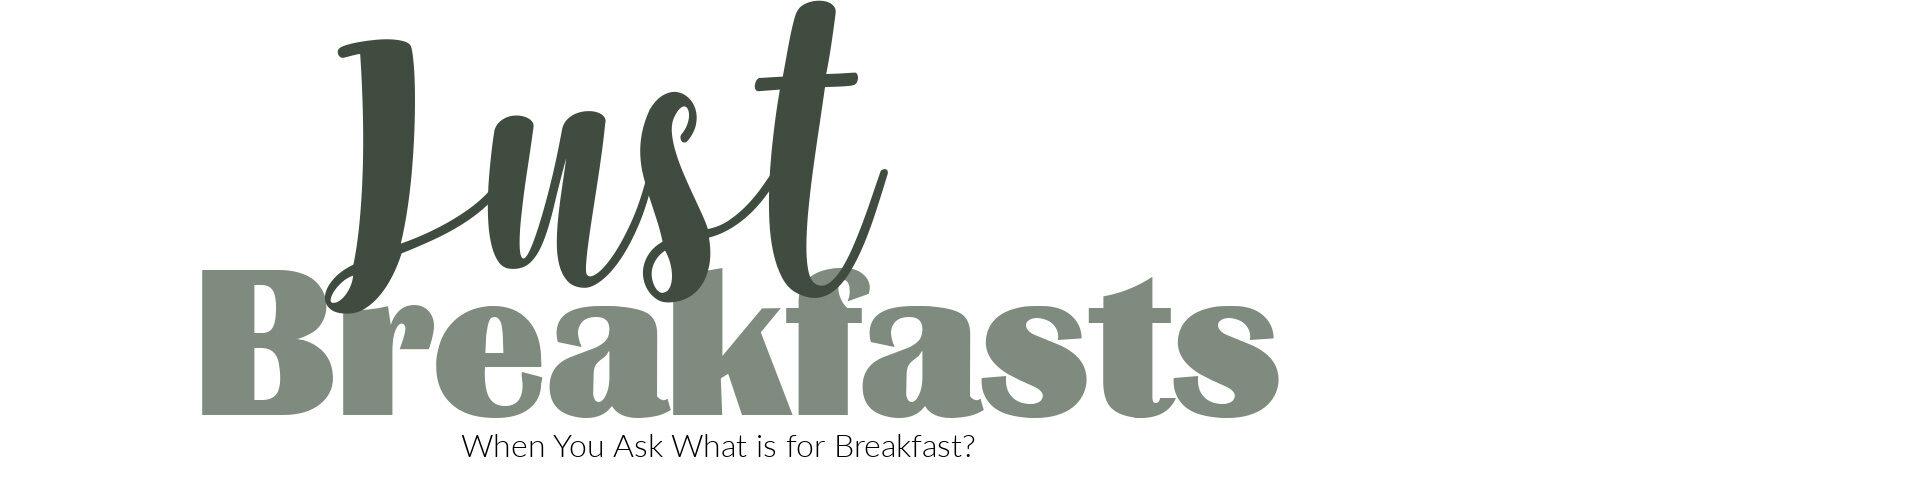 Just Breakfasts